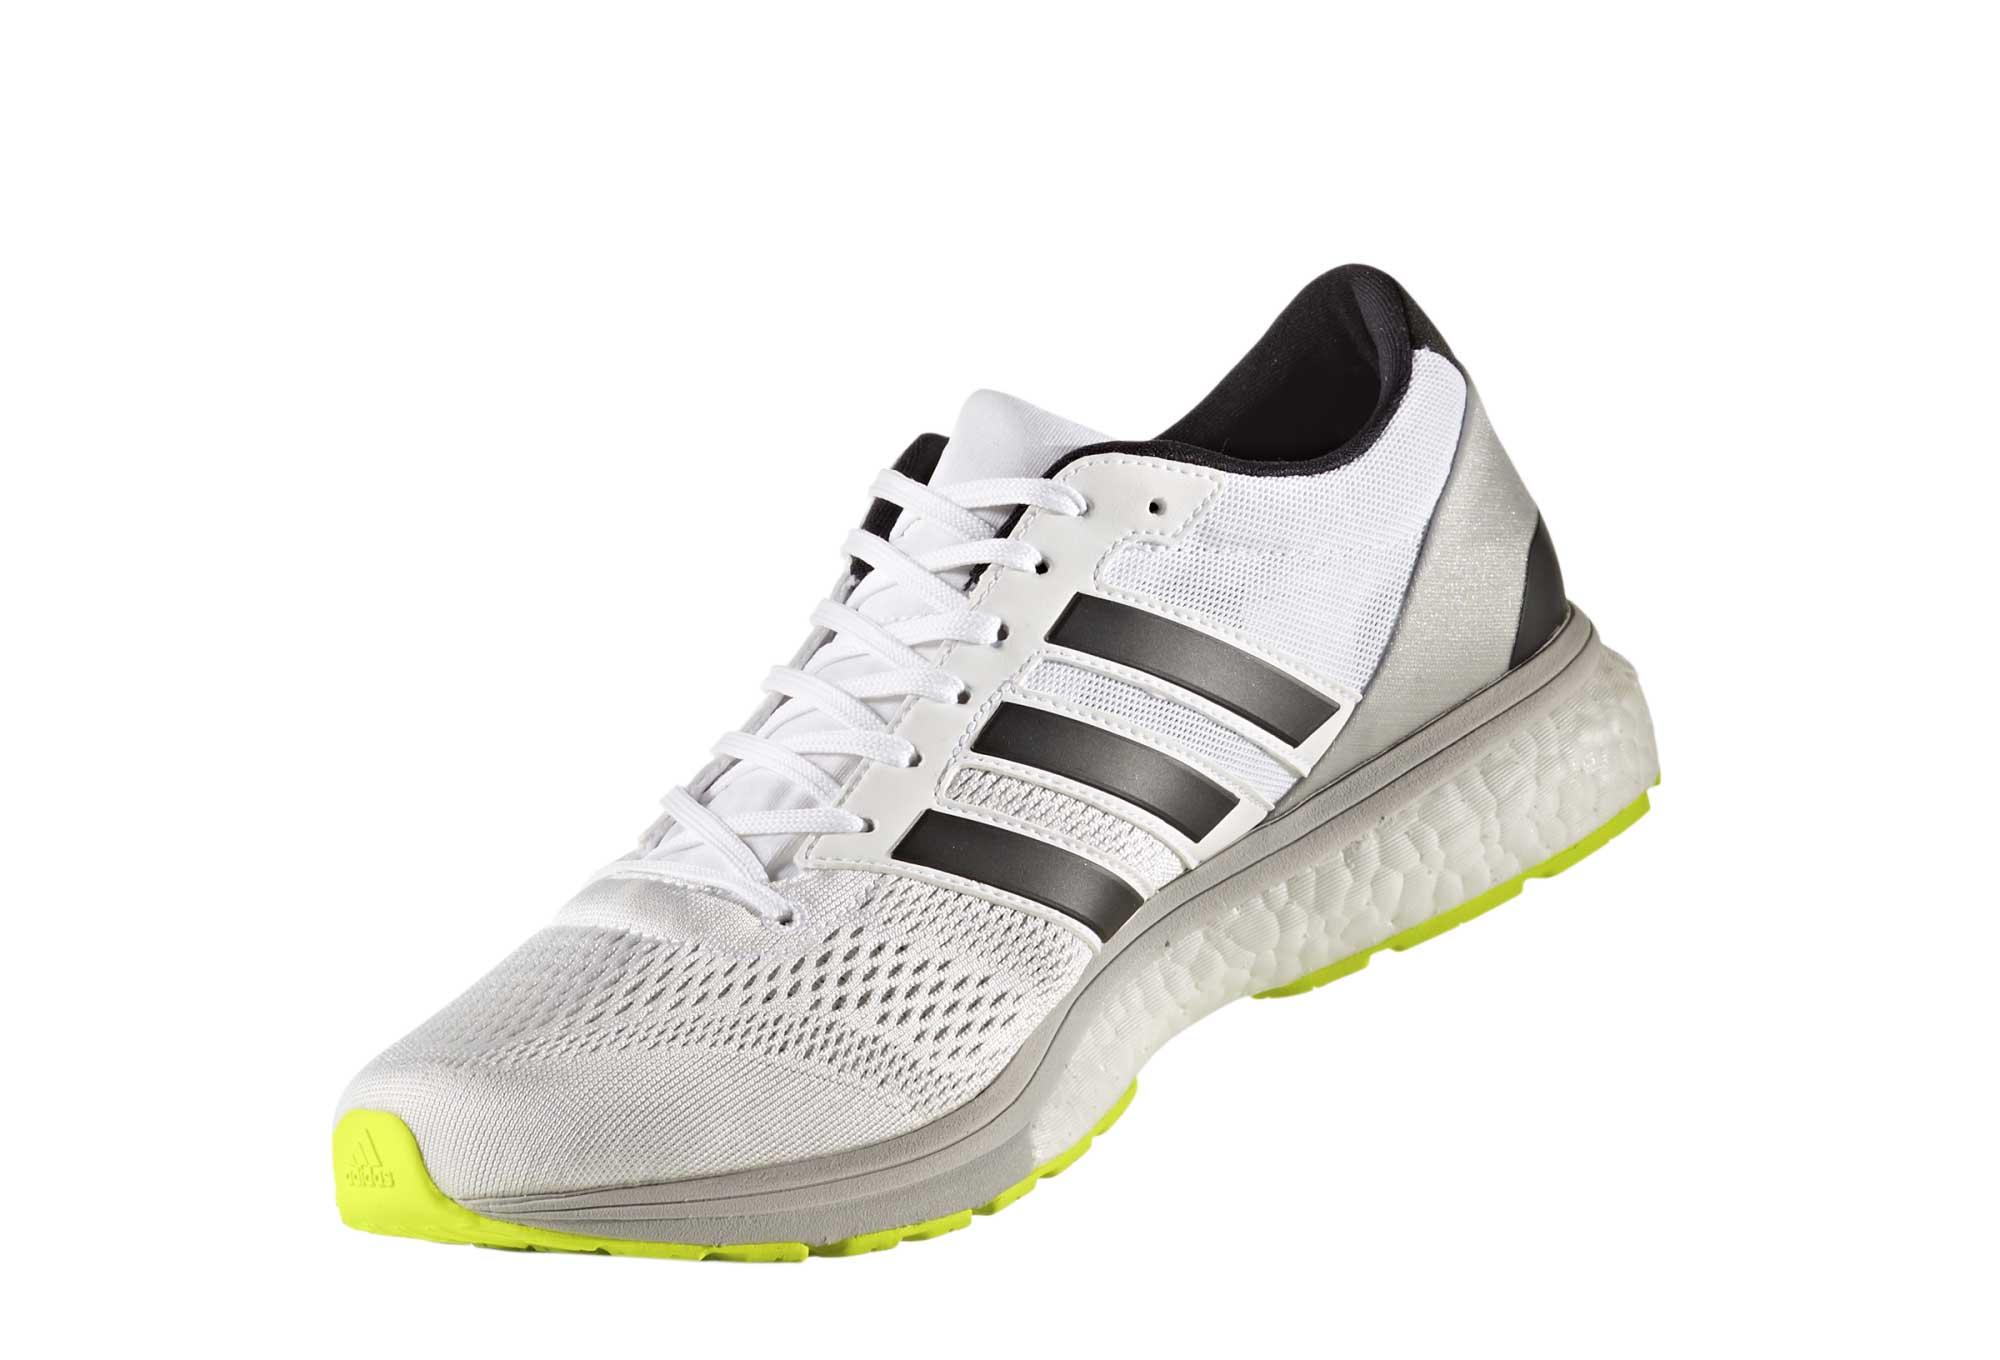 456161f1bb8 Chaussures de Running adidas running Adizero Boston 6 Blanc   Gris ...